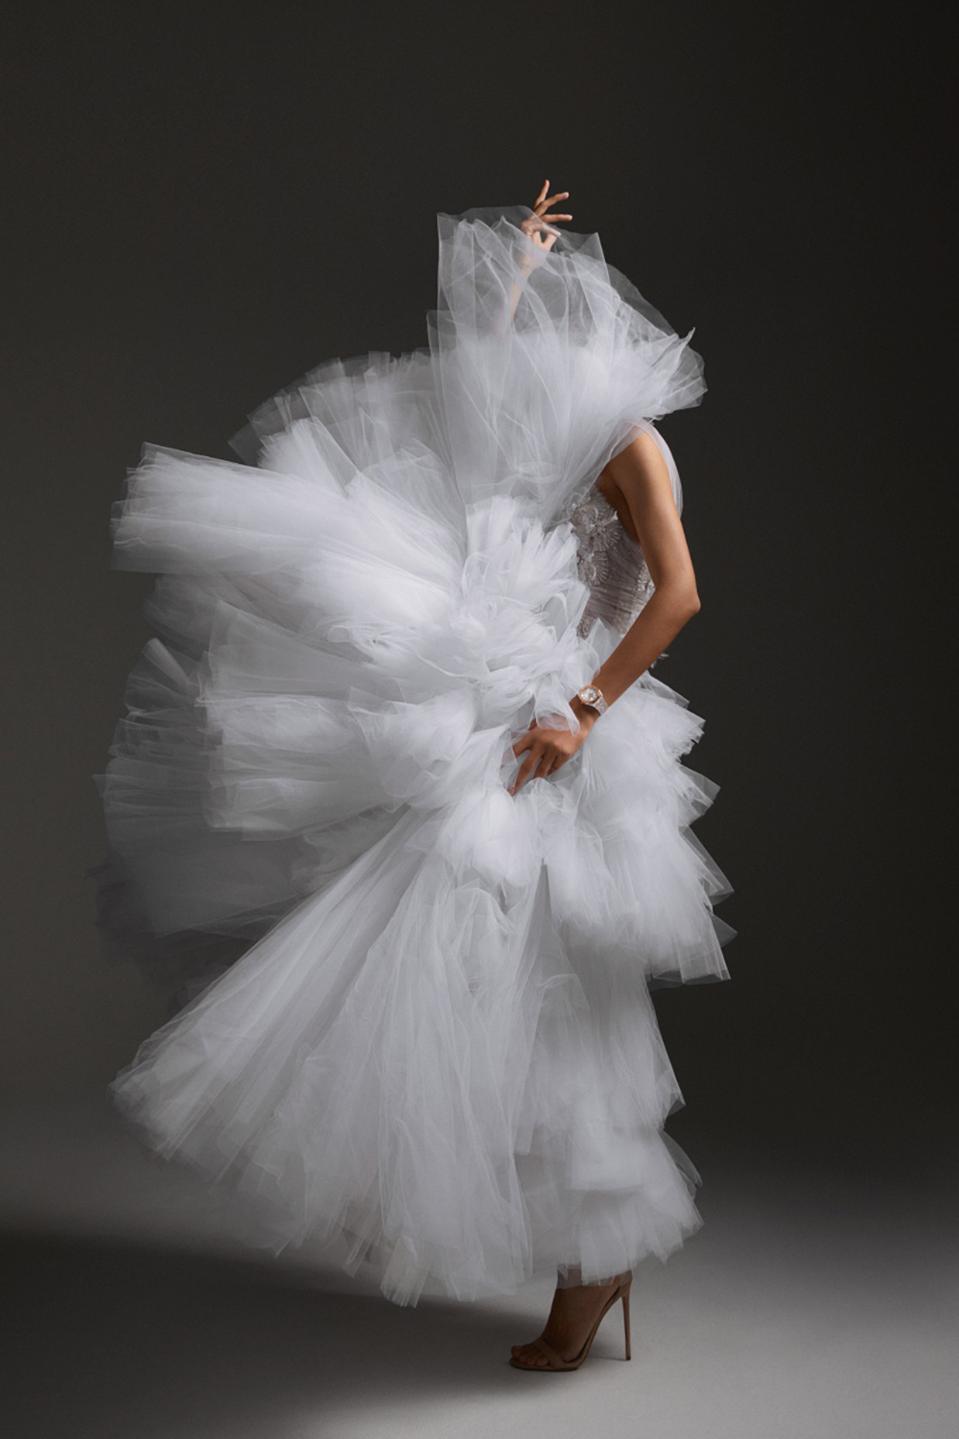 Audemars Piguet teams with fashion house Ralph & Russo to walk the catwalk at Paris Fashion Week, beginning next Monday.